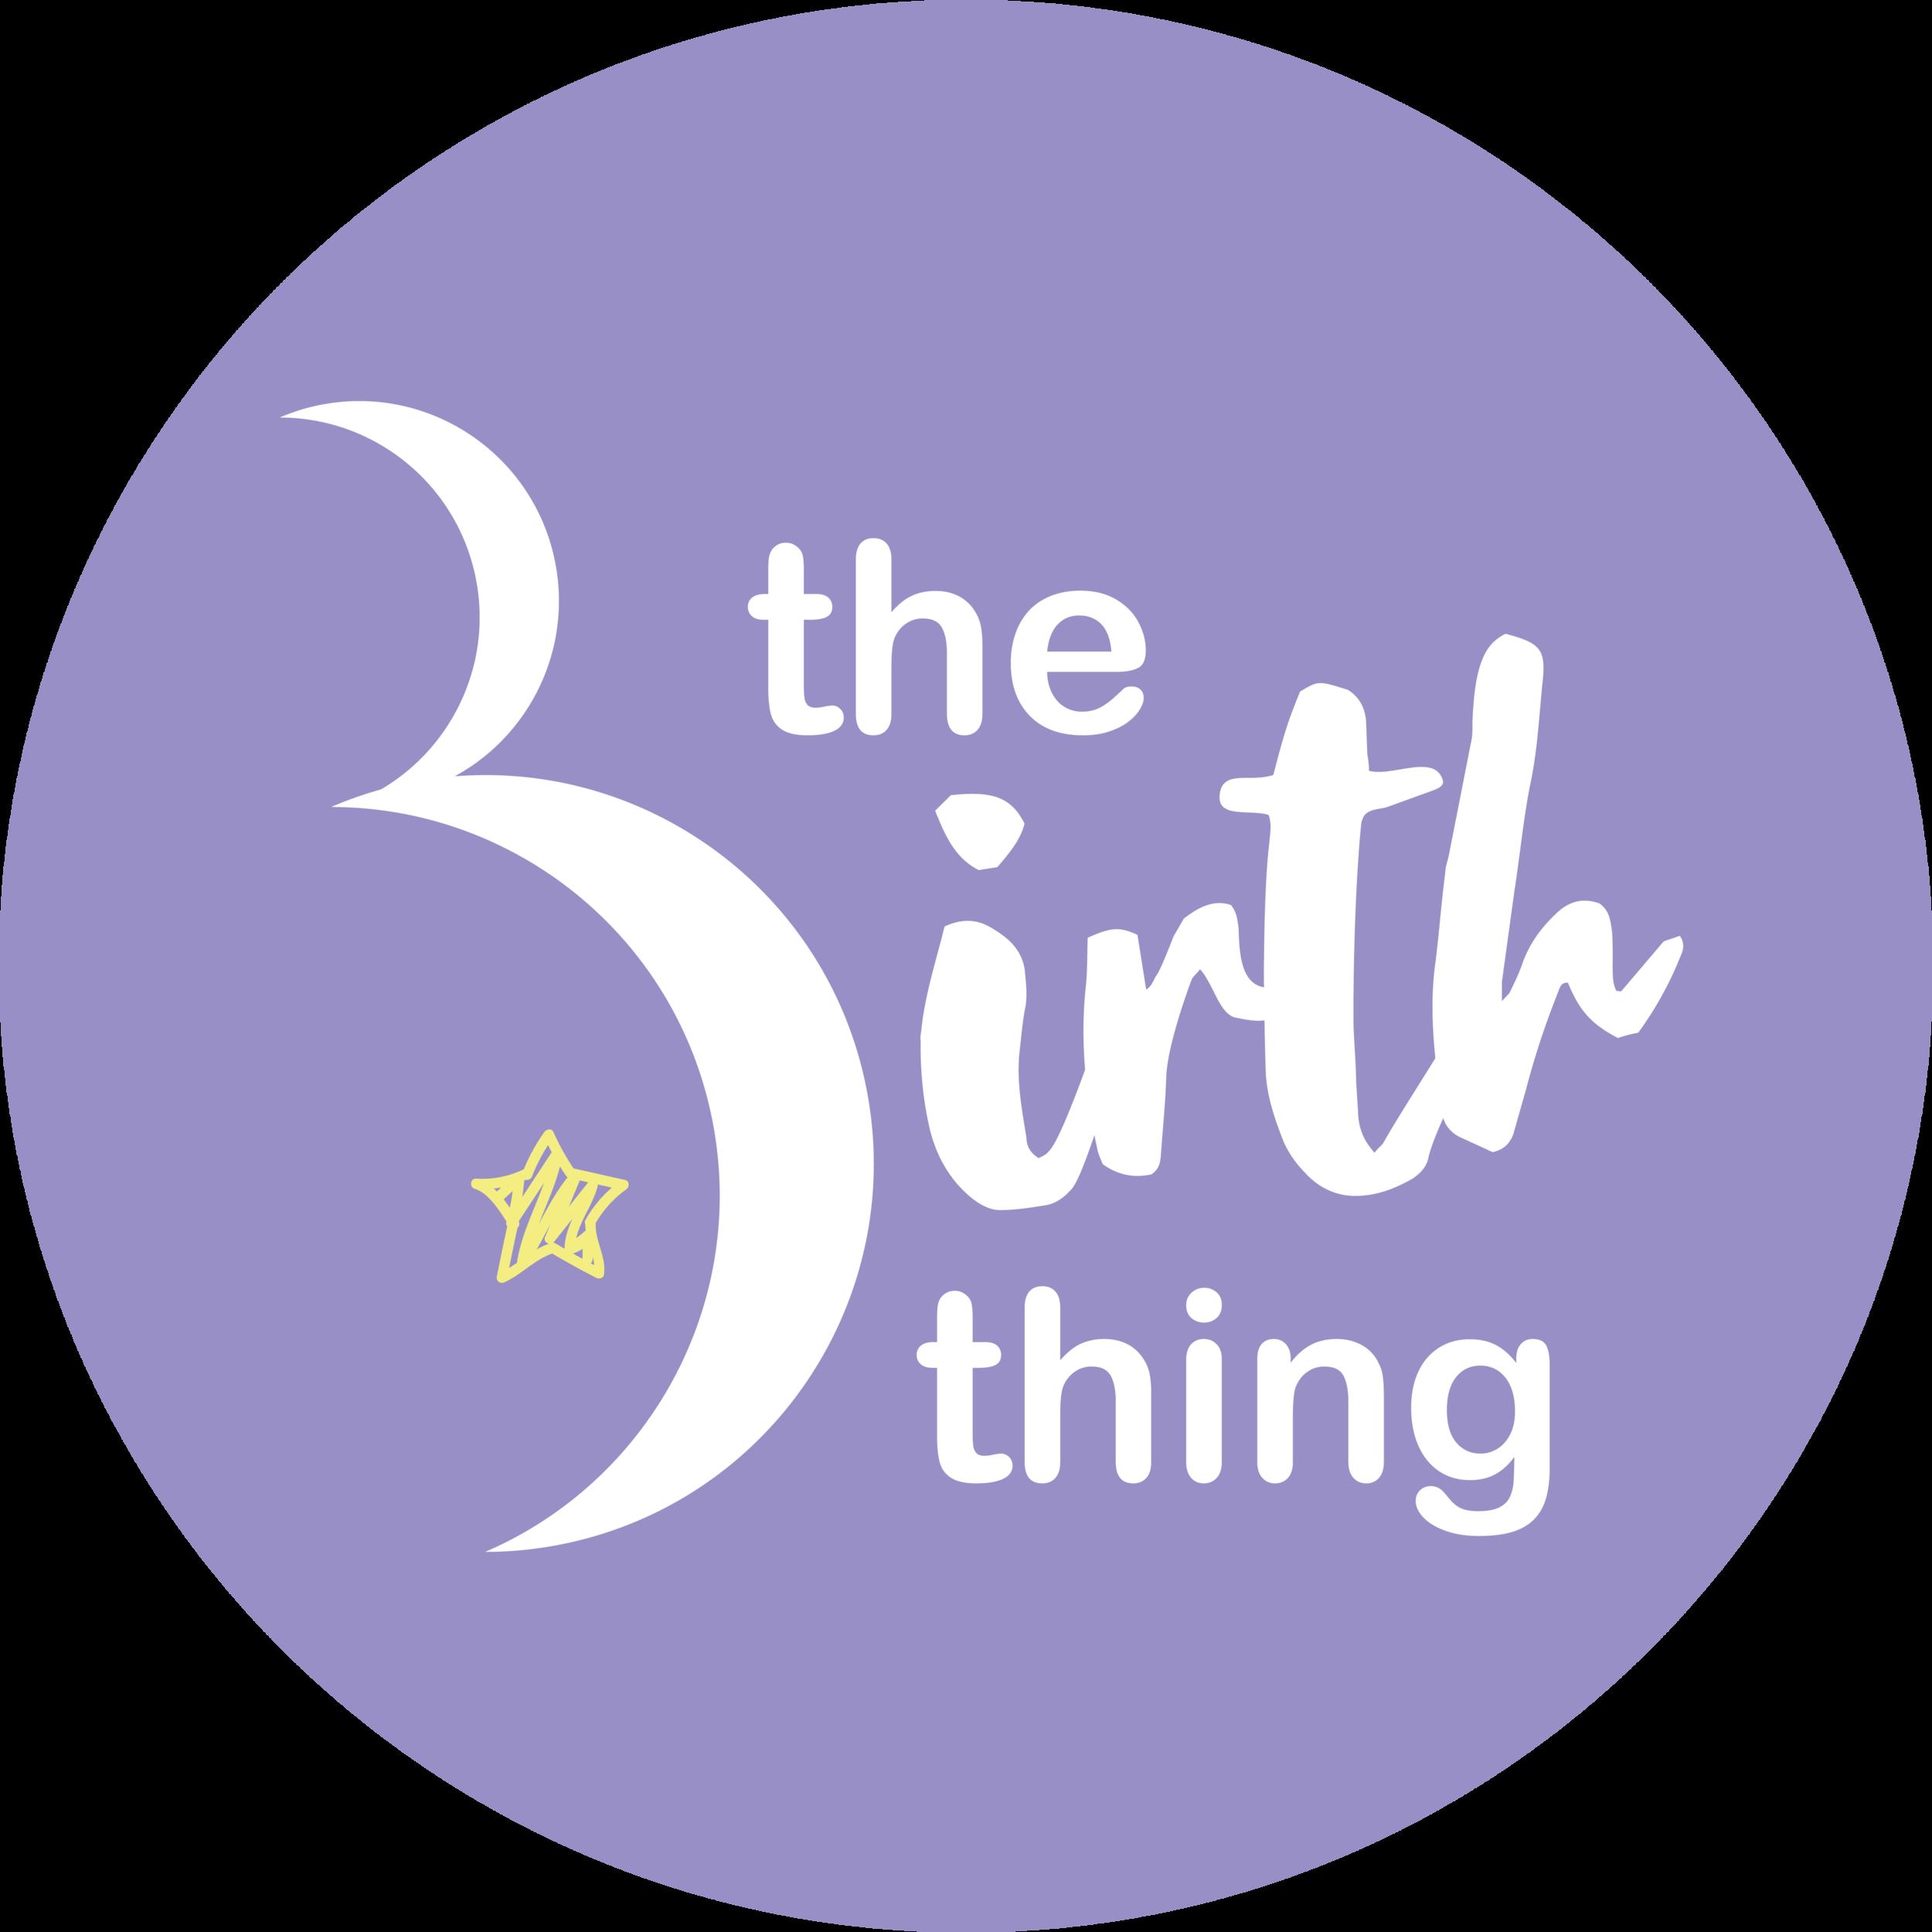 The Birth Thing PURPLE CIRCLE.png